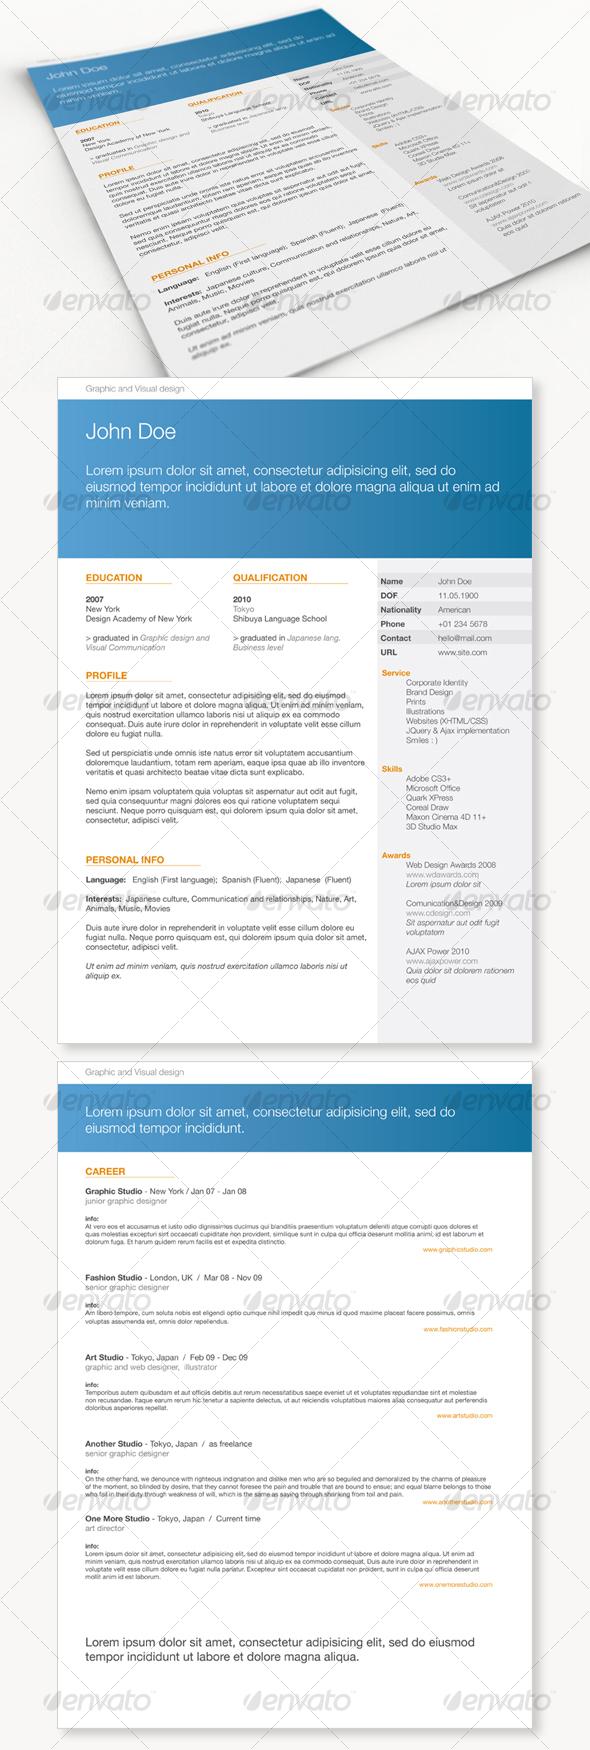 GraphicRiver Get Minimal Resume 01 106033